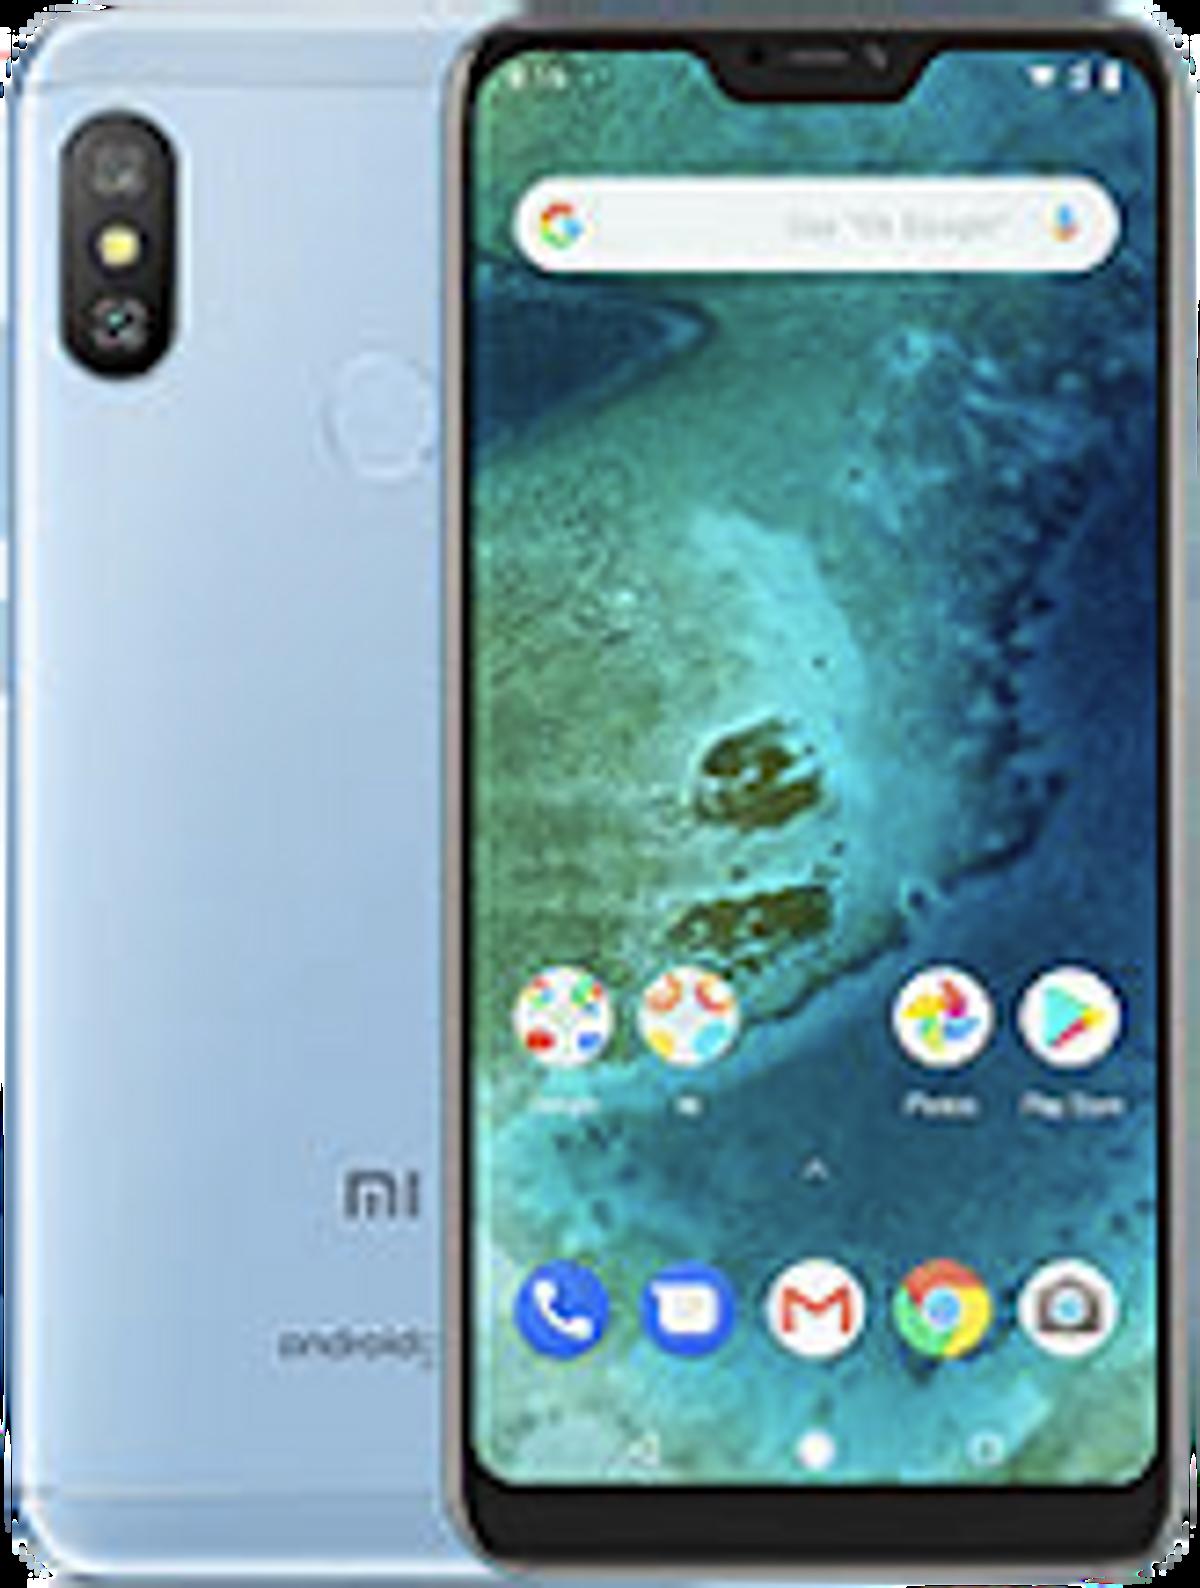 Best Xiaomi Dual Camera Phones Under 10000 - August 2019 in